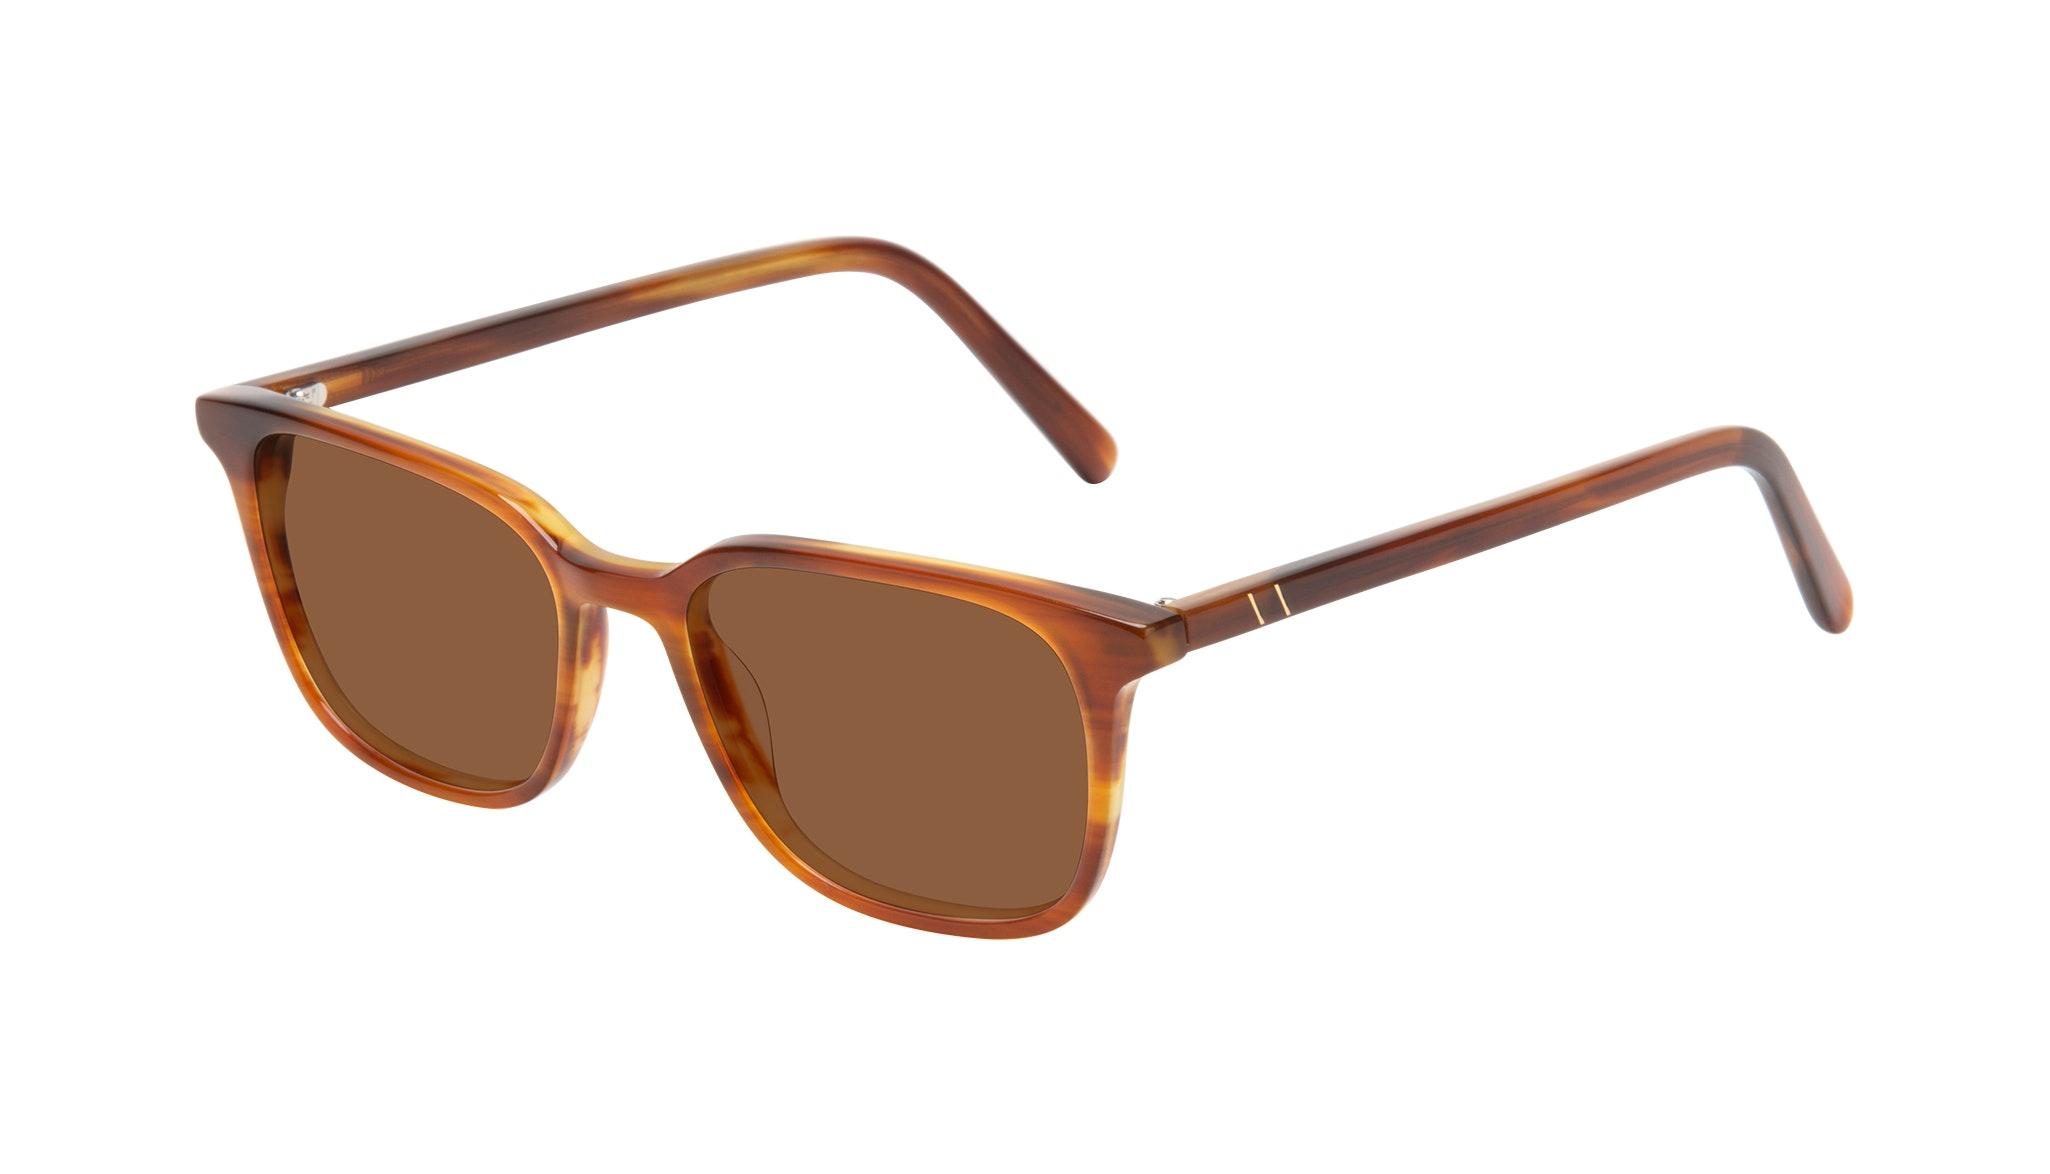 Affordable Fashion Glasses Square Sunglasses Men Choice Havana Tilt